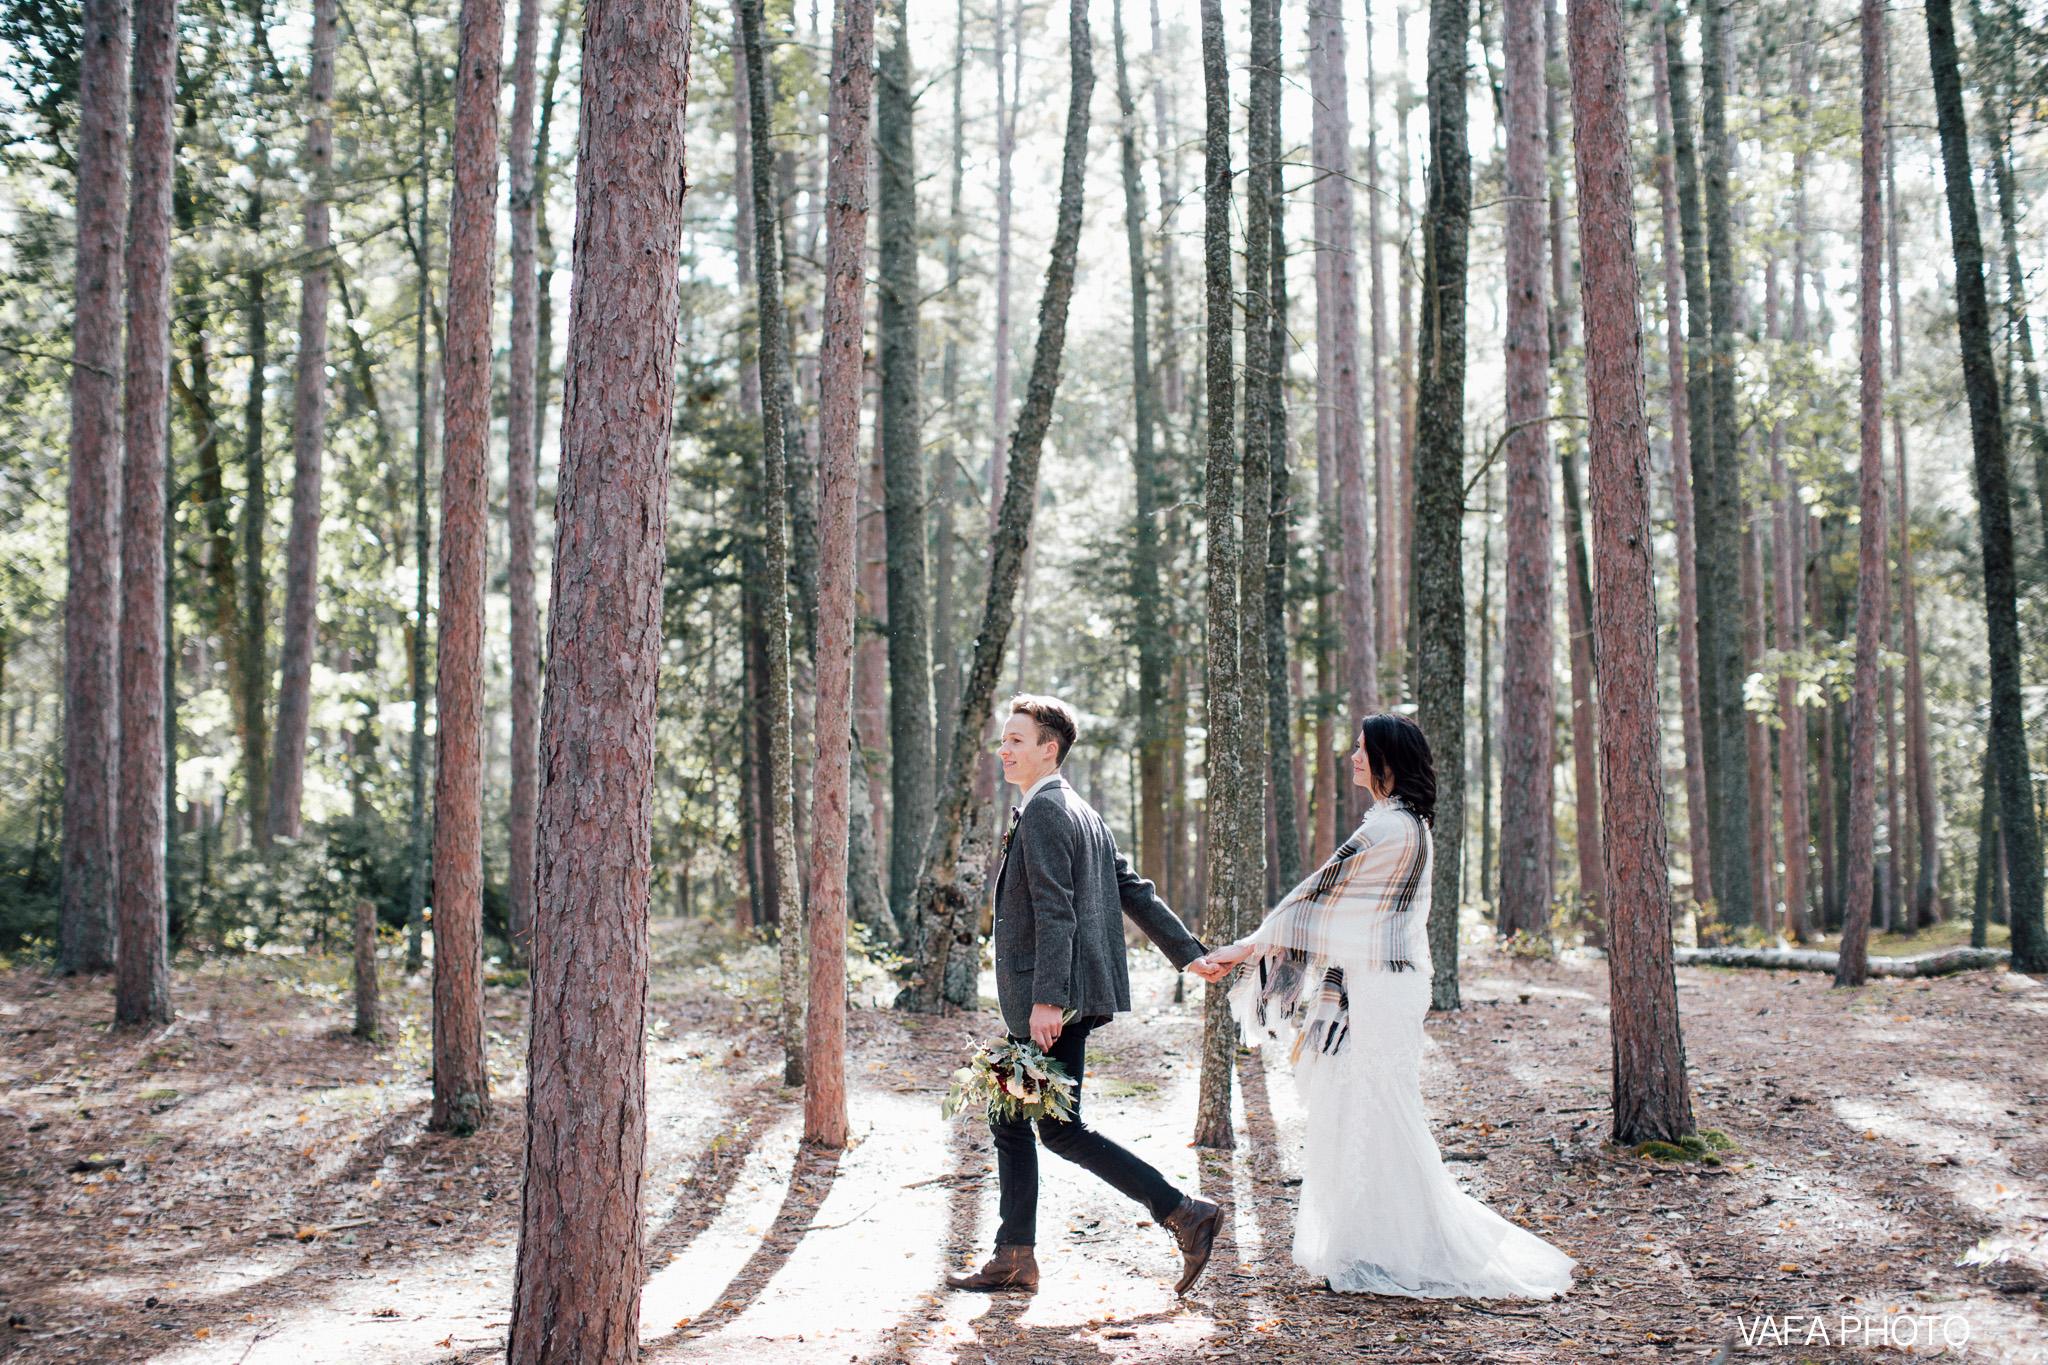 Hogback-Mountain-Wedding-Chelsea-Josh-Vafa-Photo-537.jpg